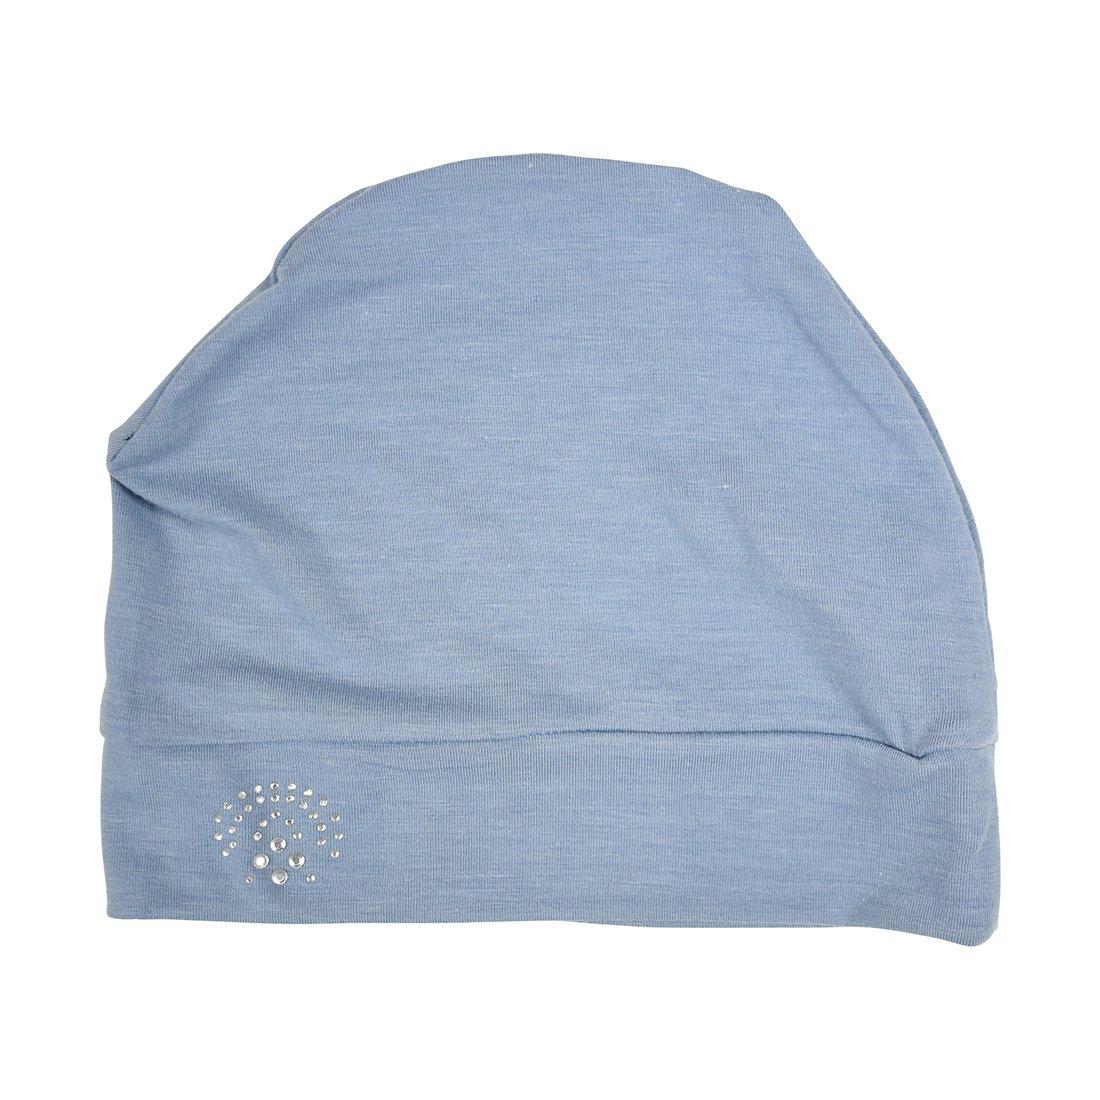 Landana Headscarves Chemo Sleep Cap Chemo Beanie with Oval Studs Cancer Hat lduc-black-a36